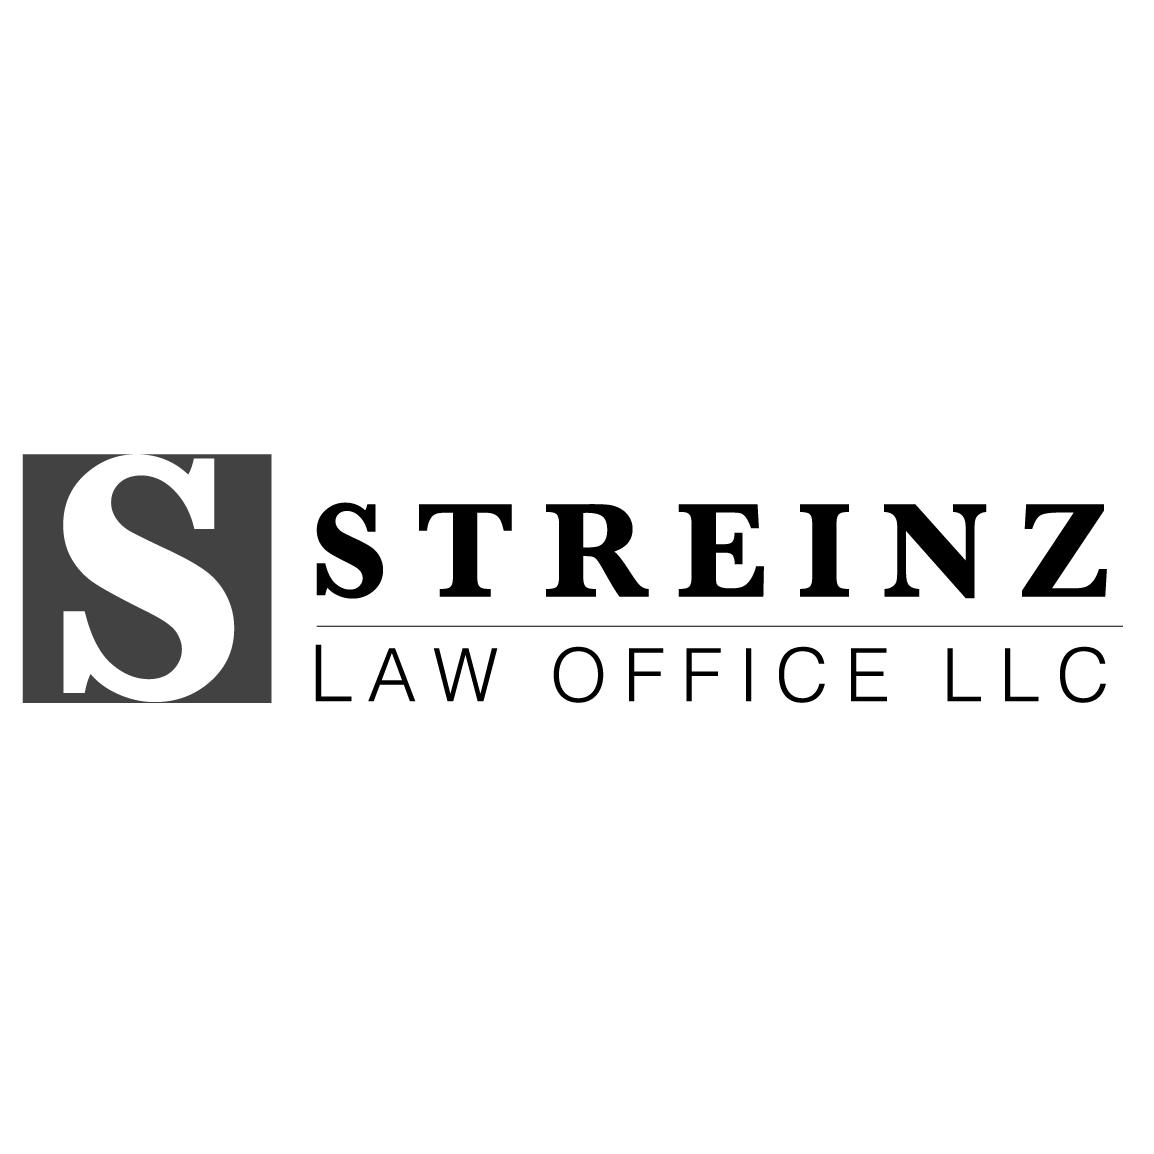 Streinz Law Office LLC image 0